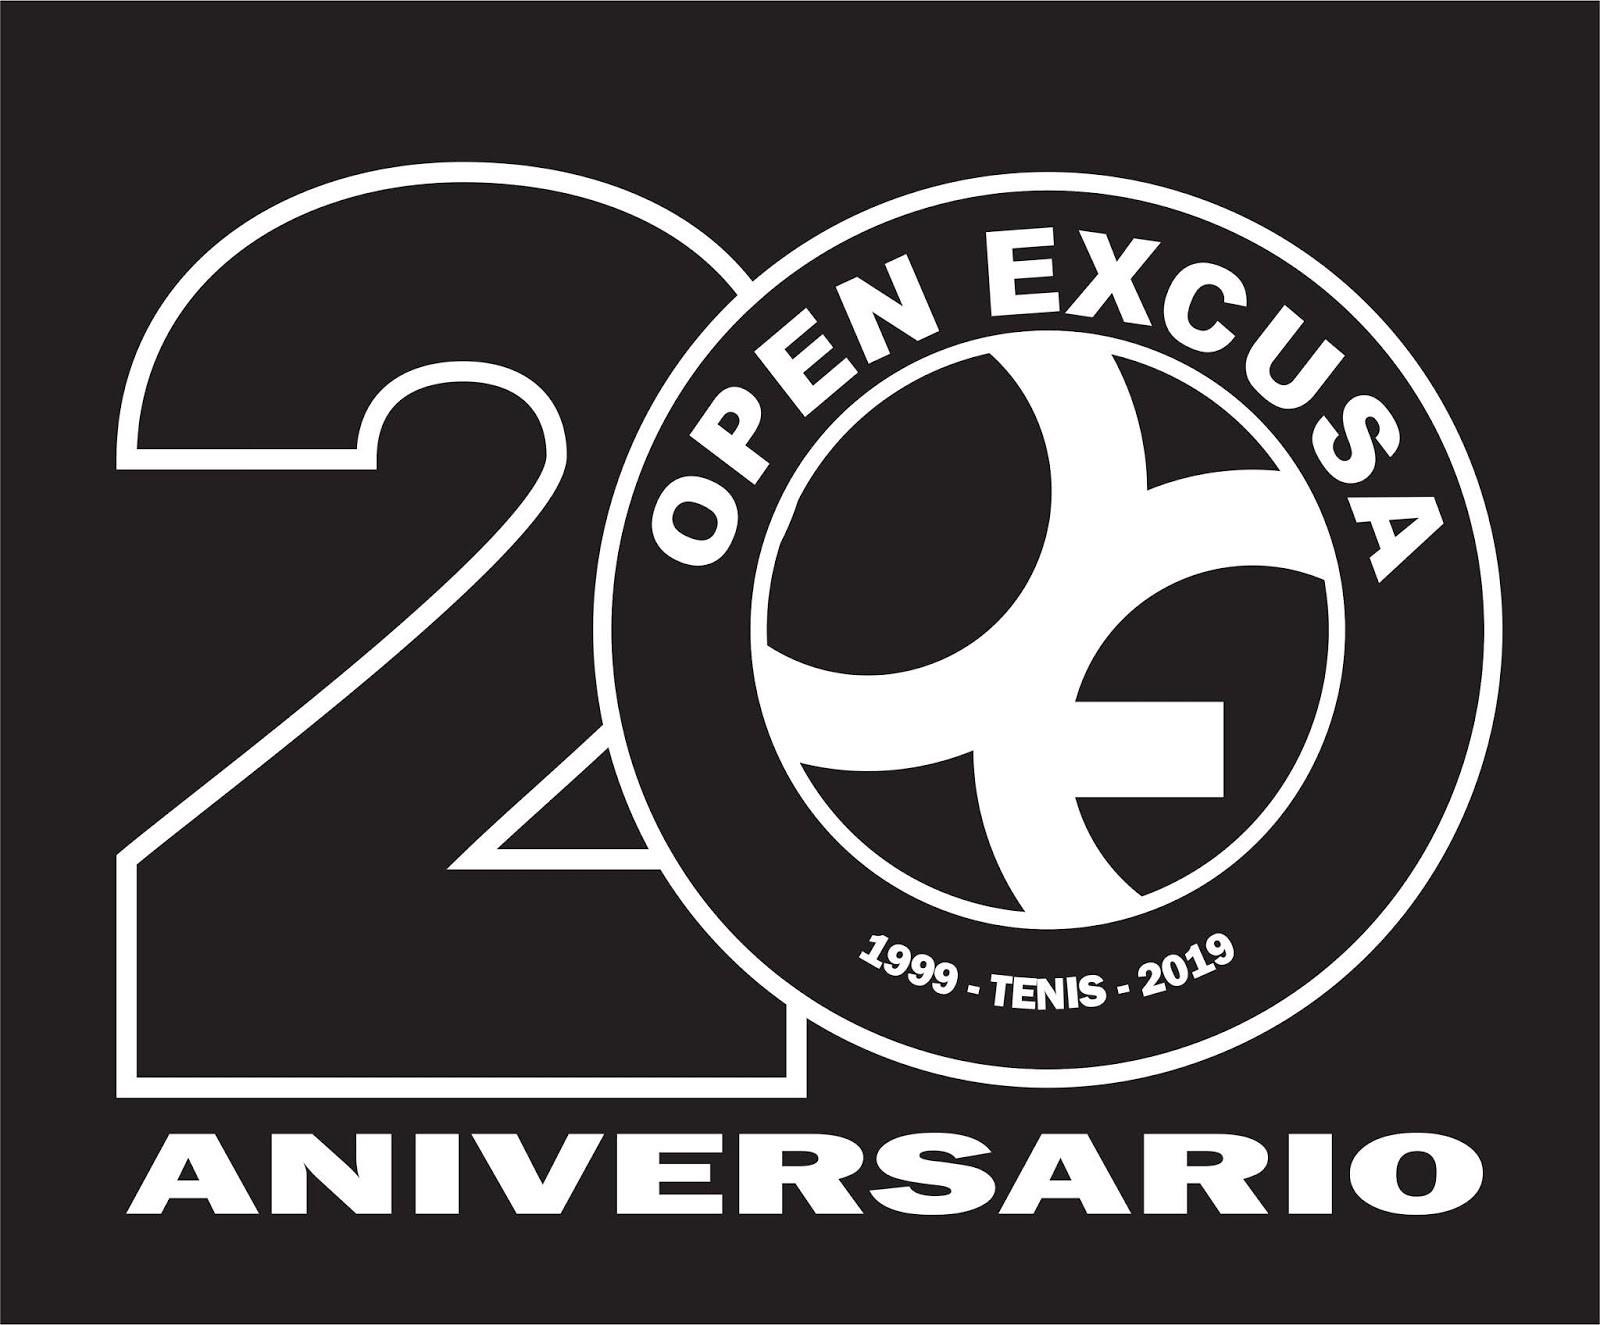 TENIS Open Excusa 2018 09